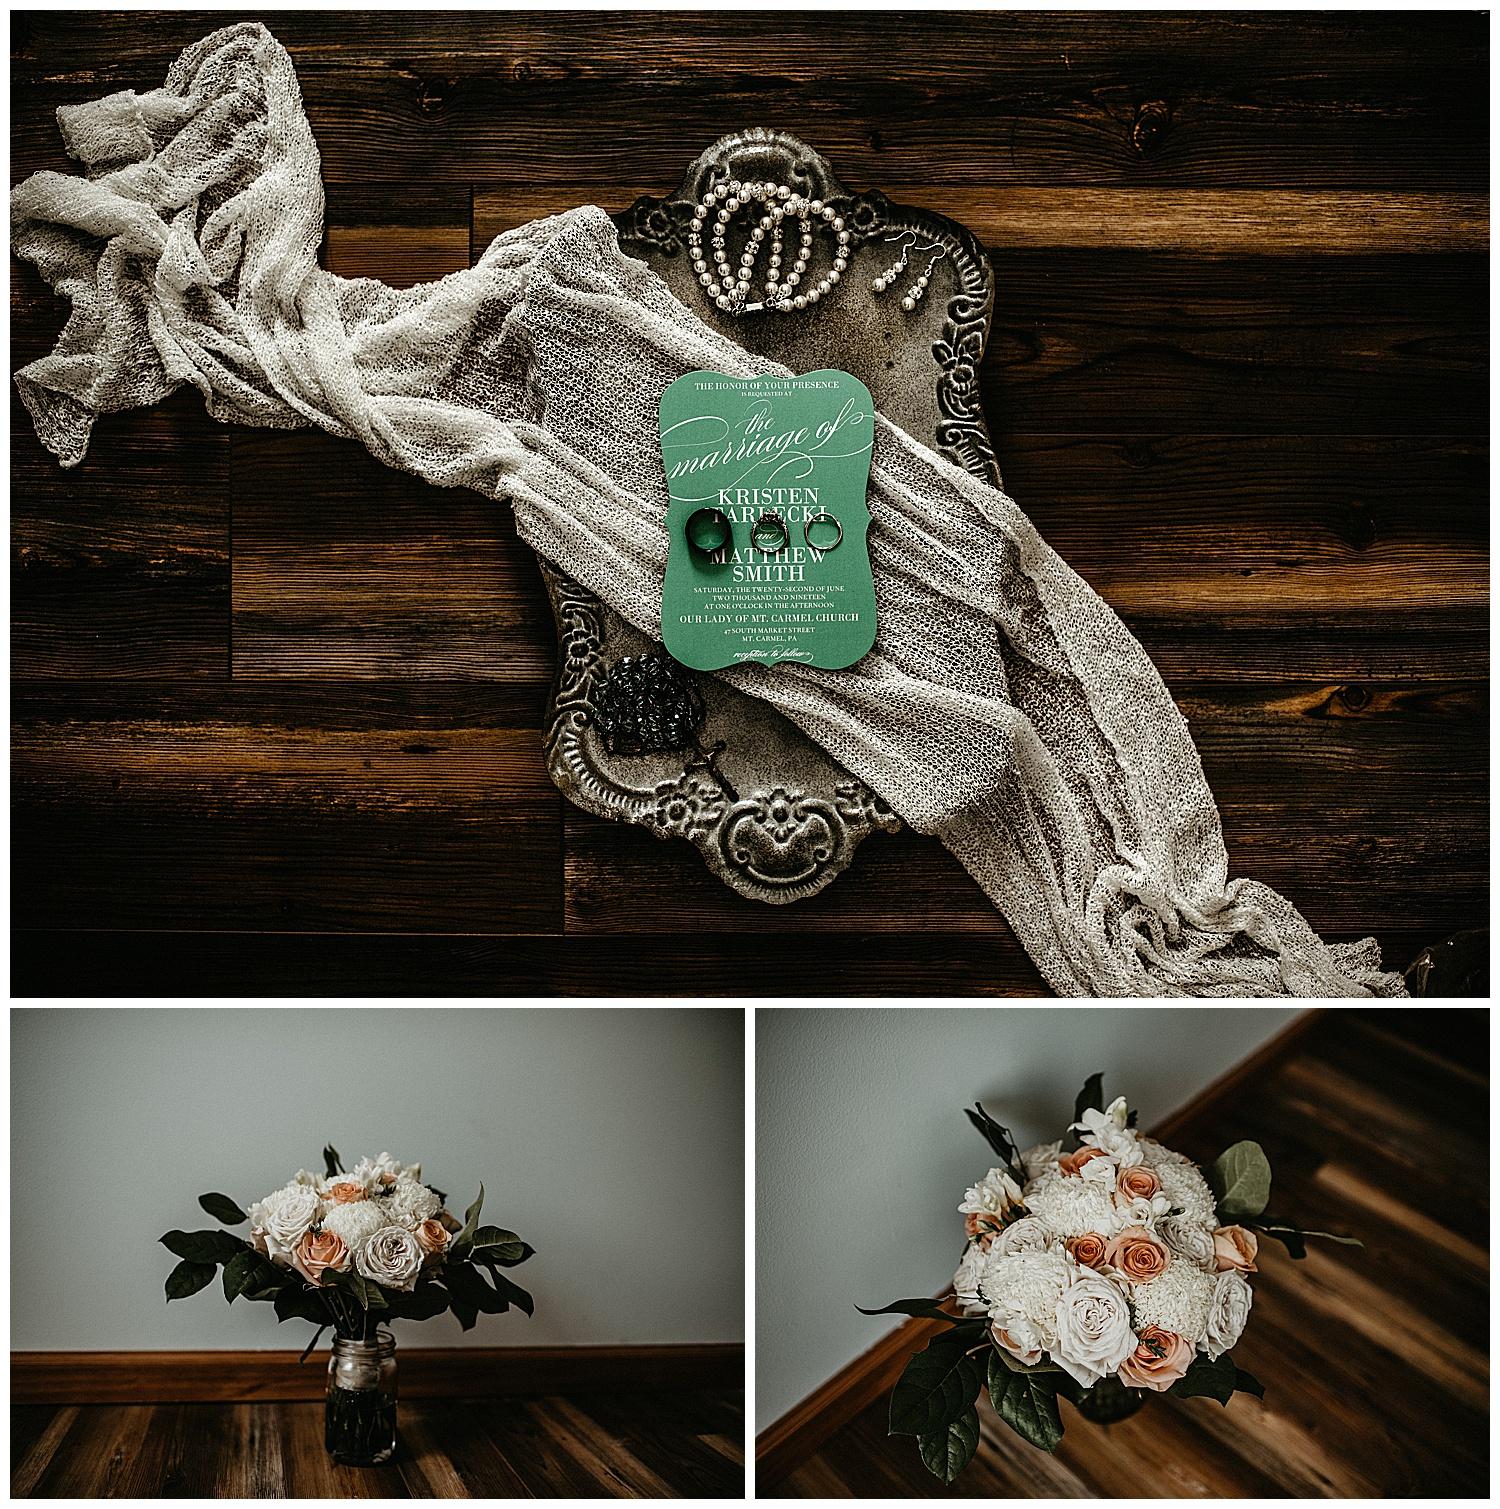 NEPA-Lehigh-Valley-Wedding-Photographer-at-Fountain-Springs-Country-Inn-Ashland-PA_0002.jpg